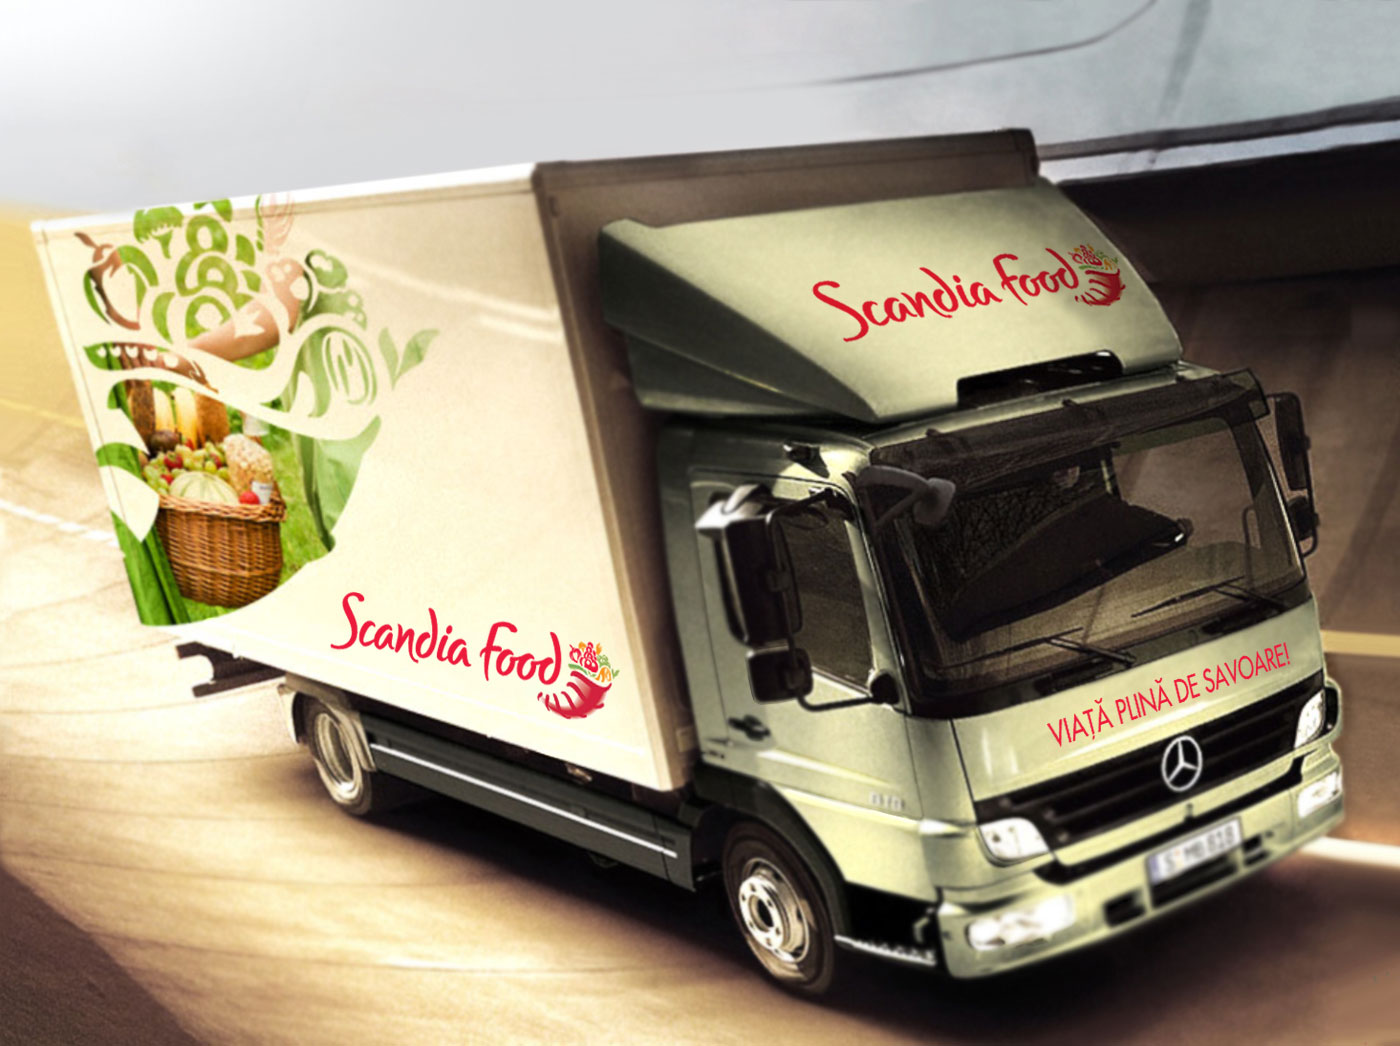 scandia food rebranding